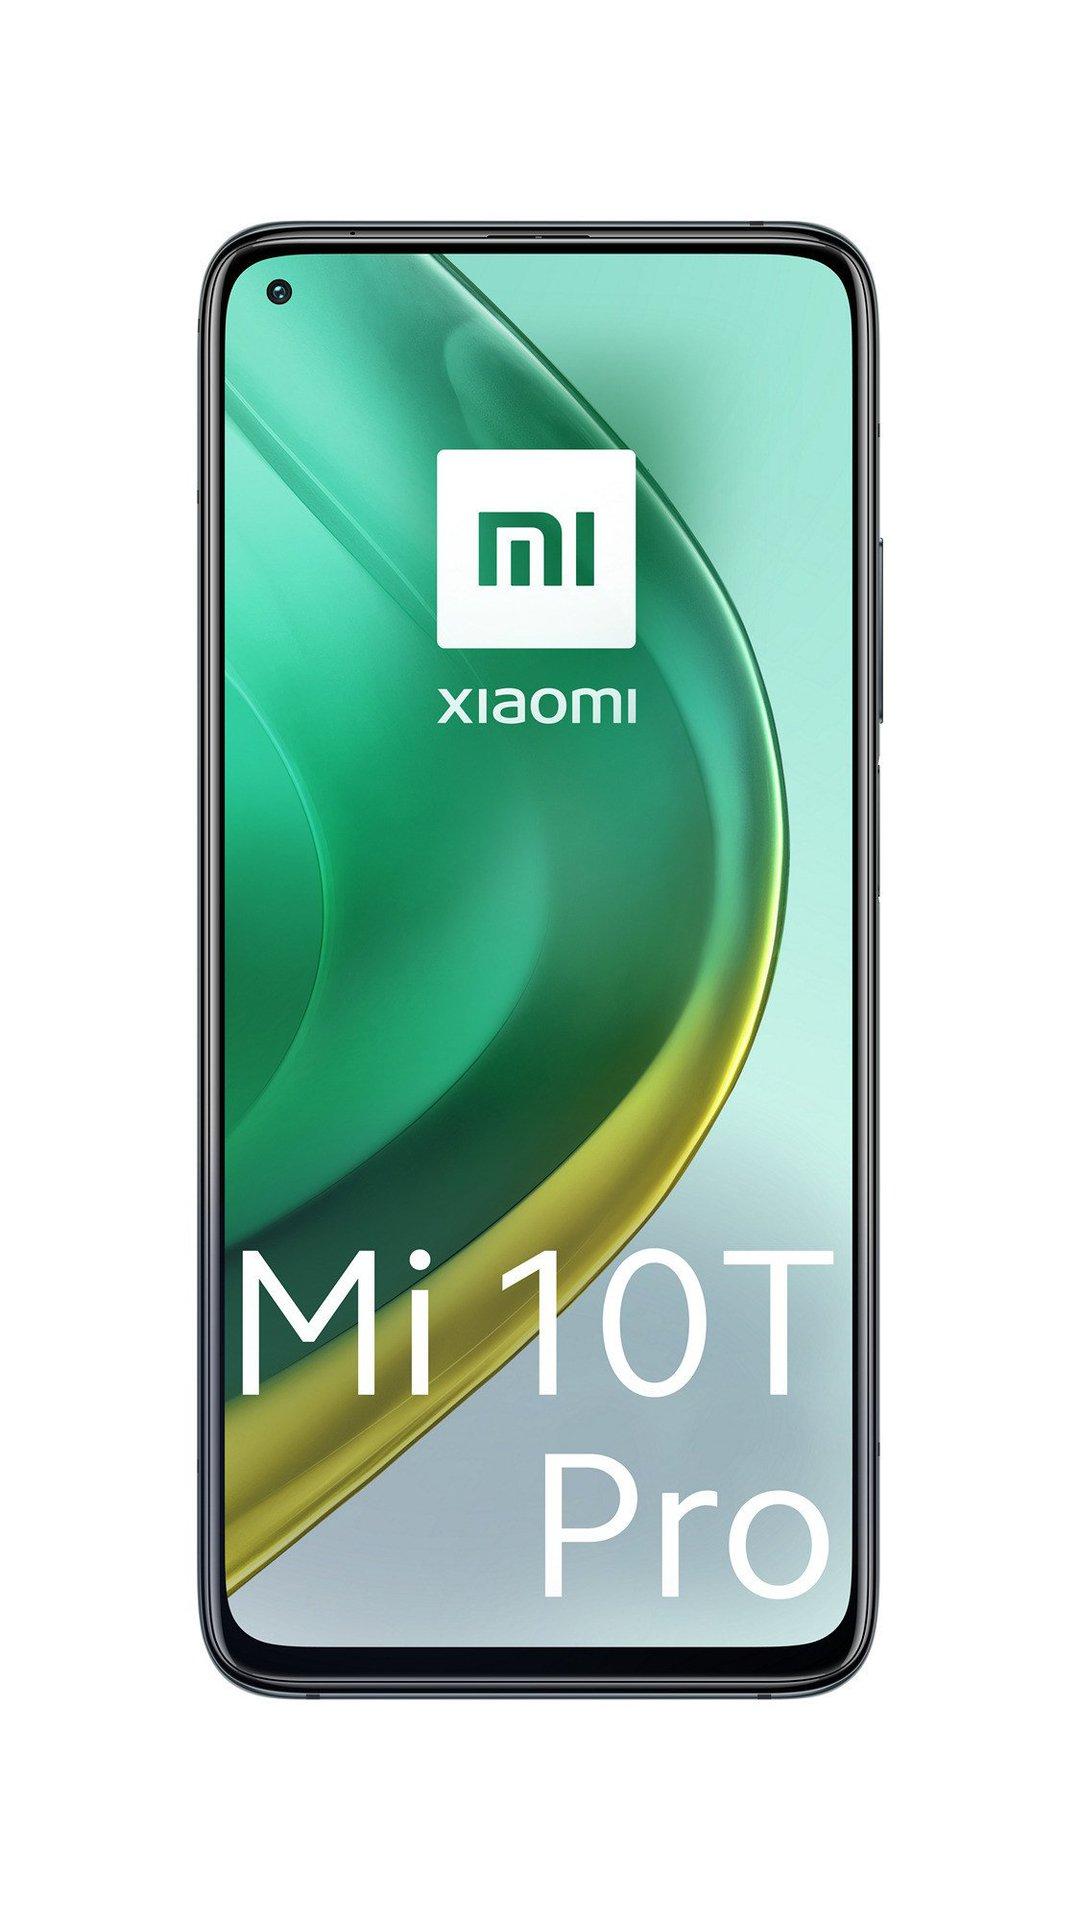 Xiaomi Mi 10T Pro render leak showing display